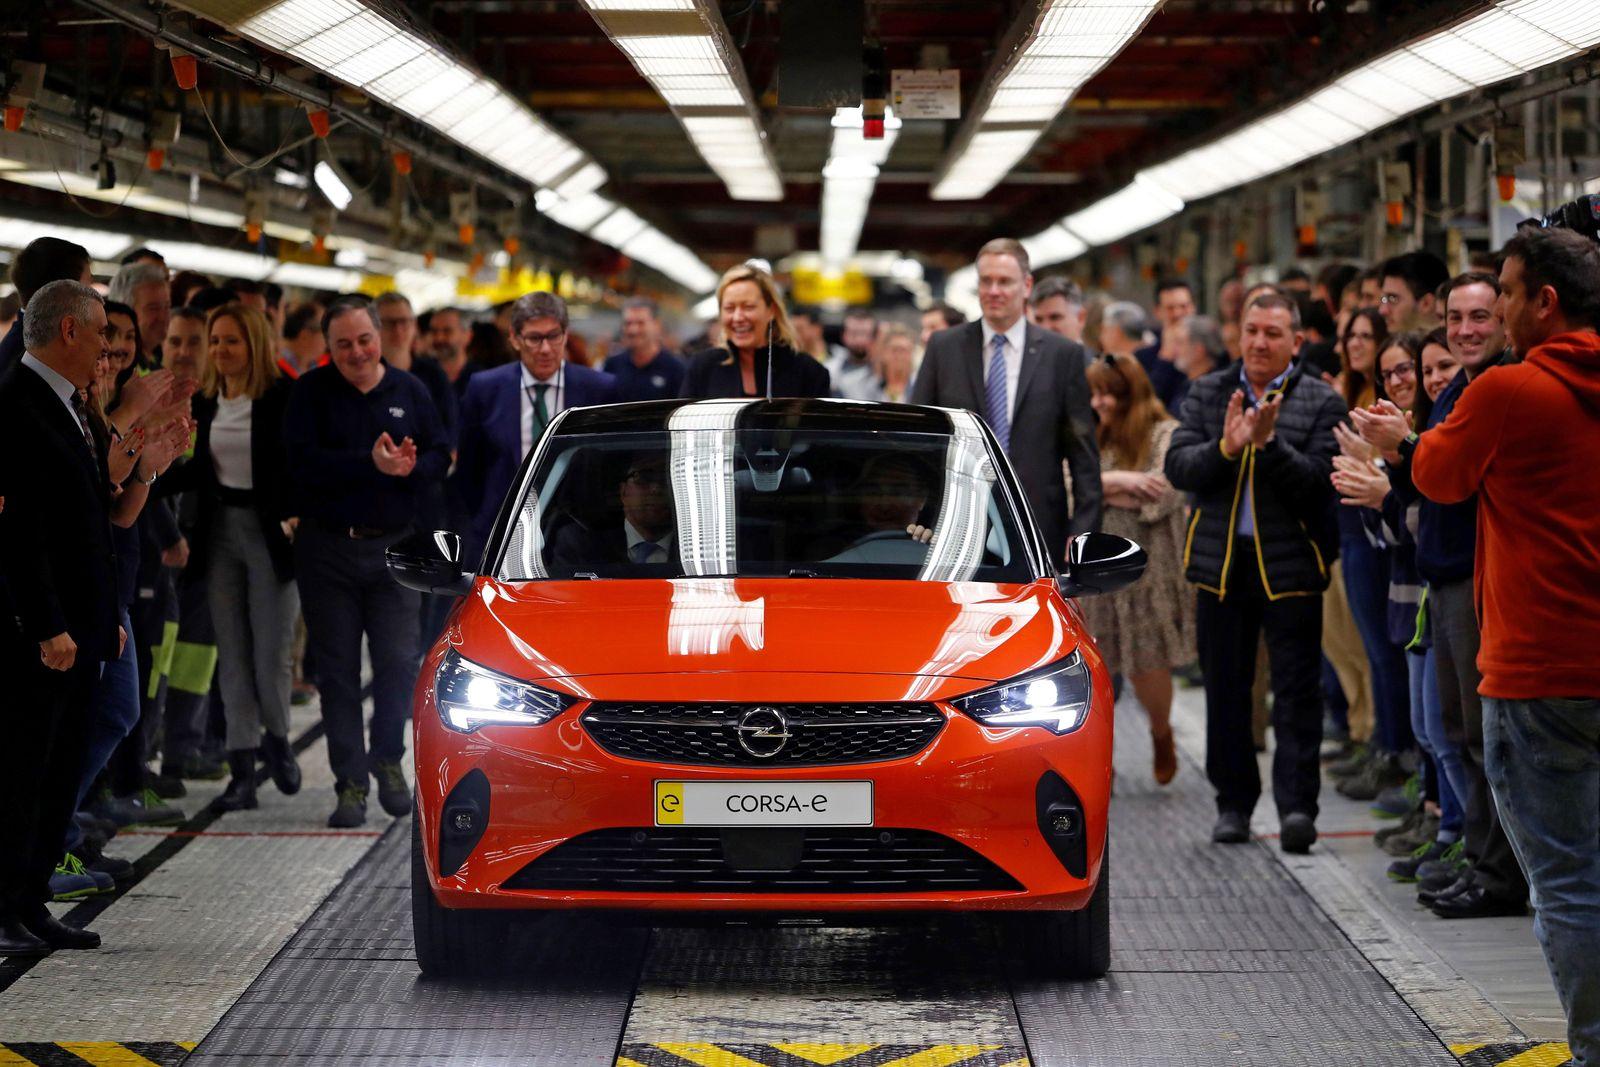 Launching of Opel Corsa-e, Figueruelas Zaragoza, Spain - 21 Feb 2020